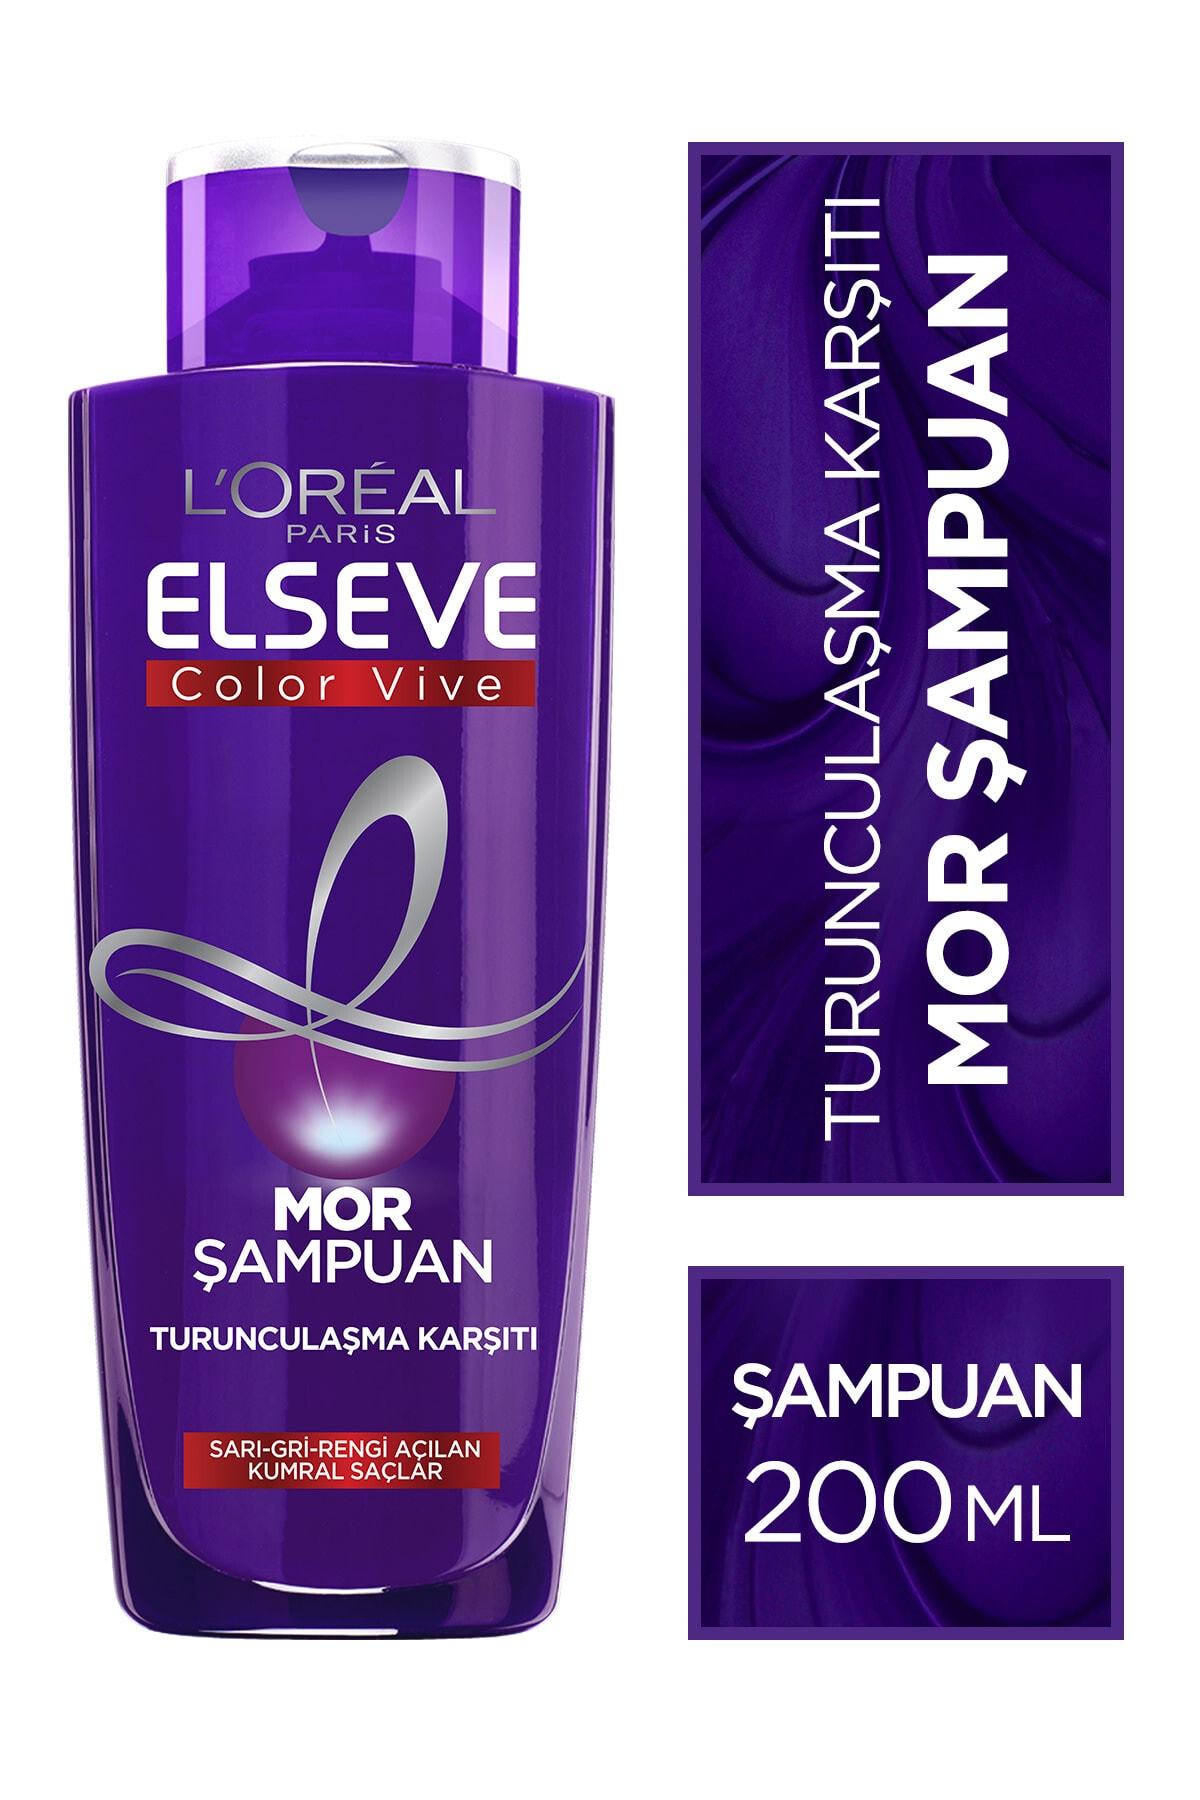 ELSEVE L'oréal Paris Elseve Turunculaşma Karşıtı Mor Şampuan 200ml 1